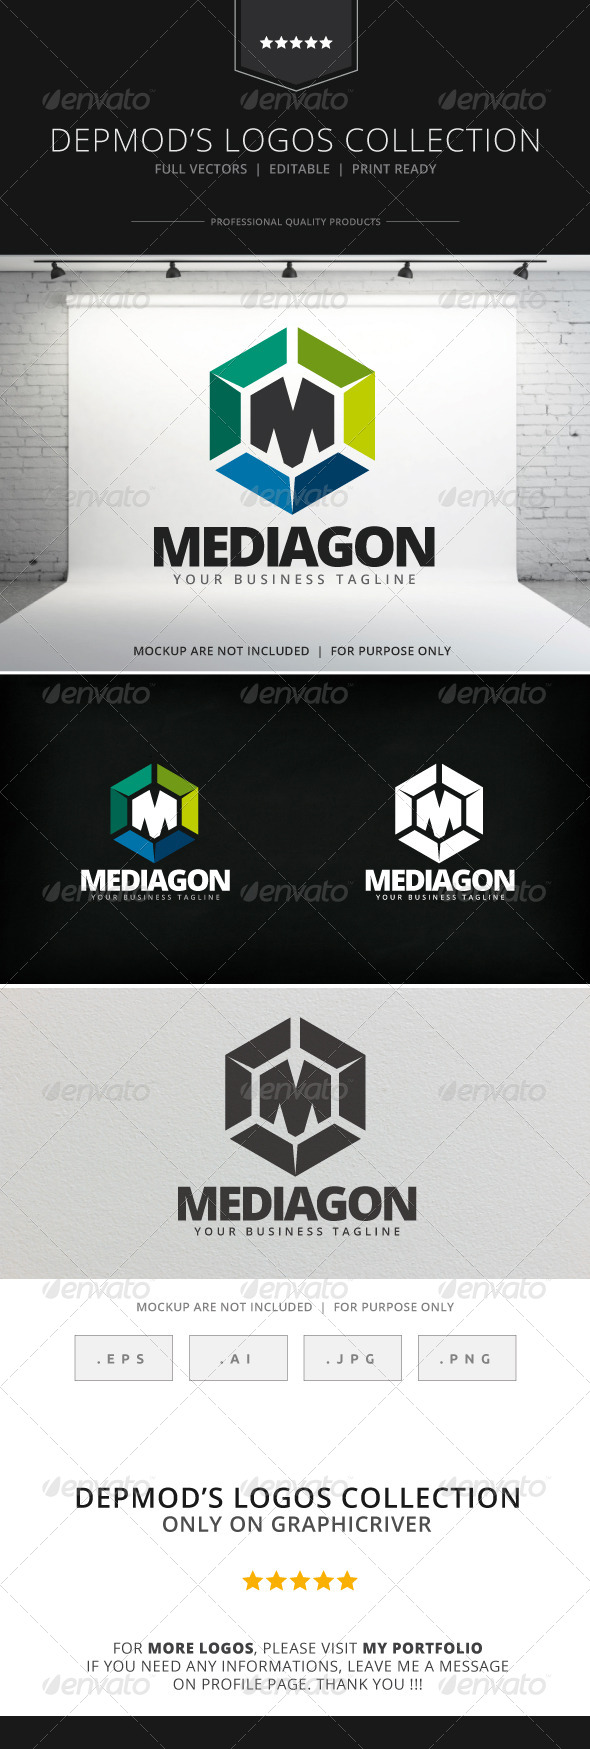 Mediagon Logo